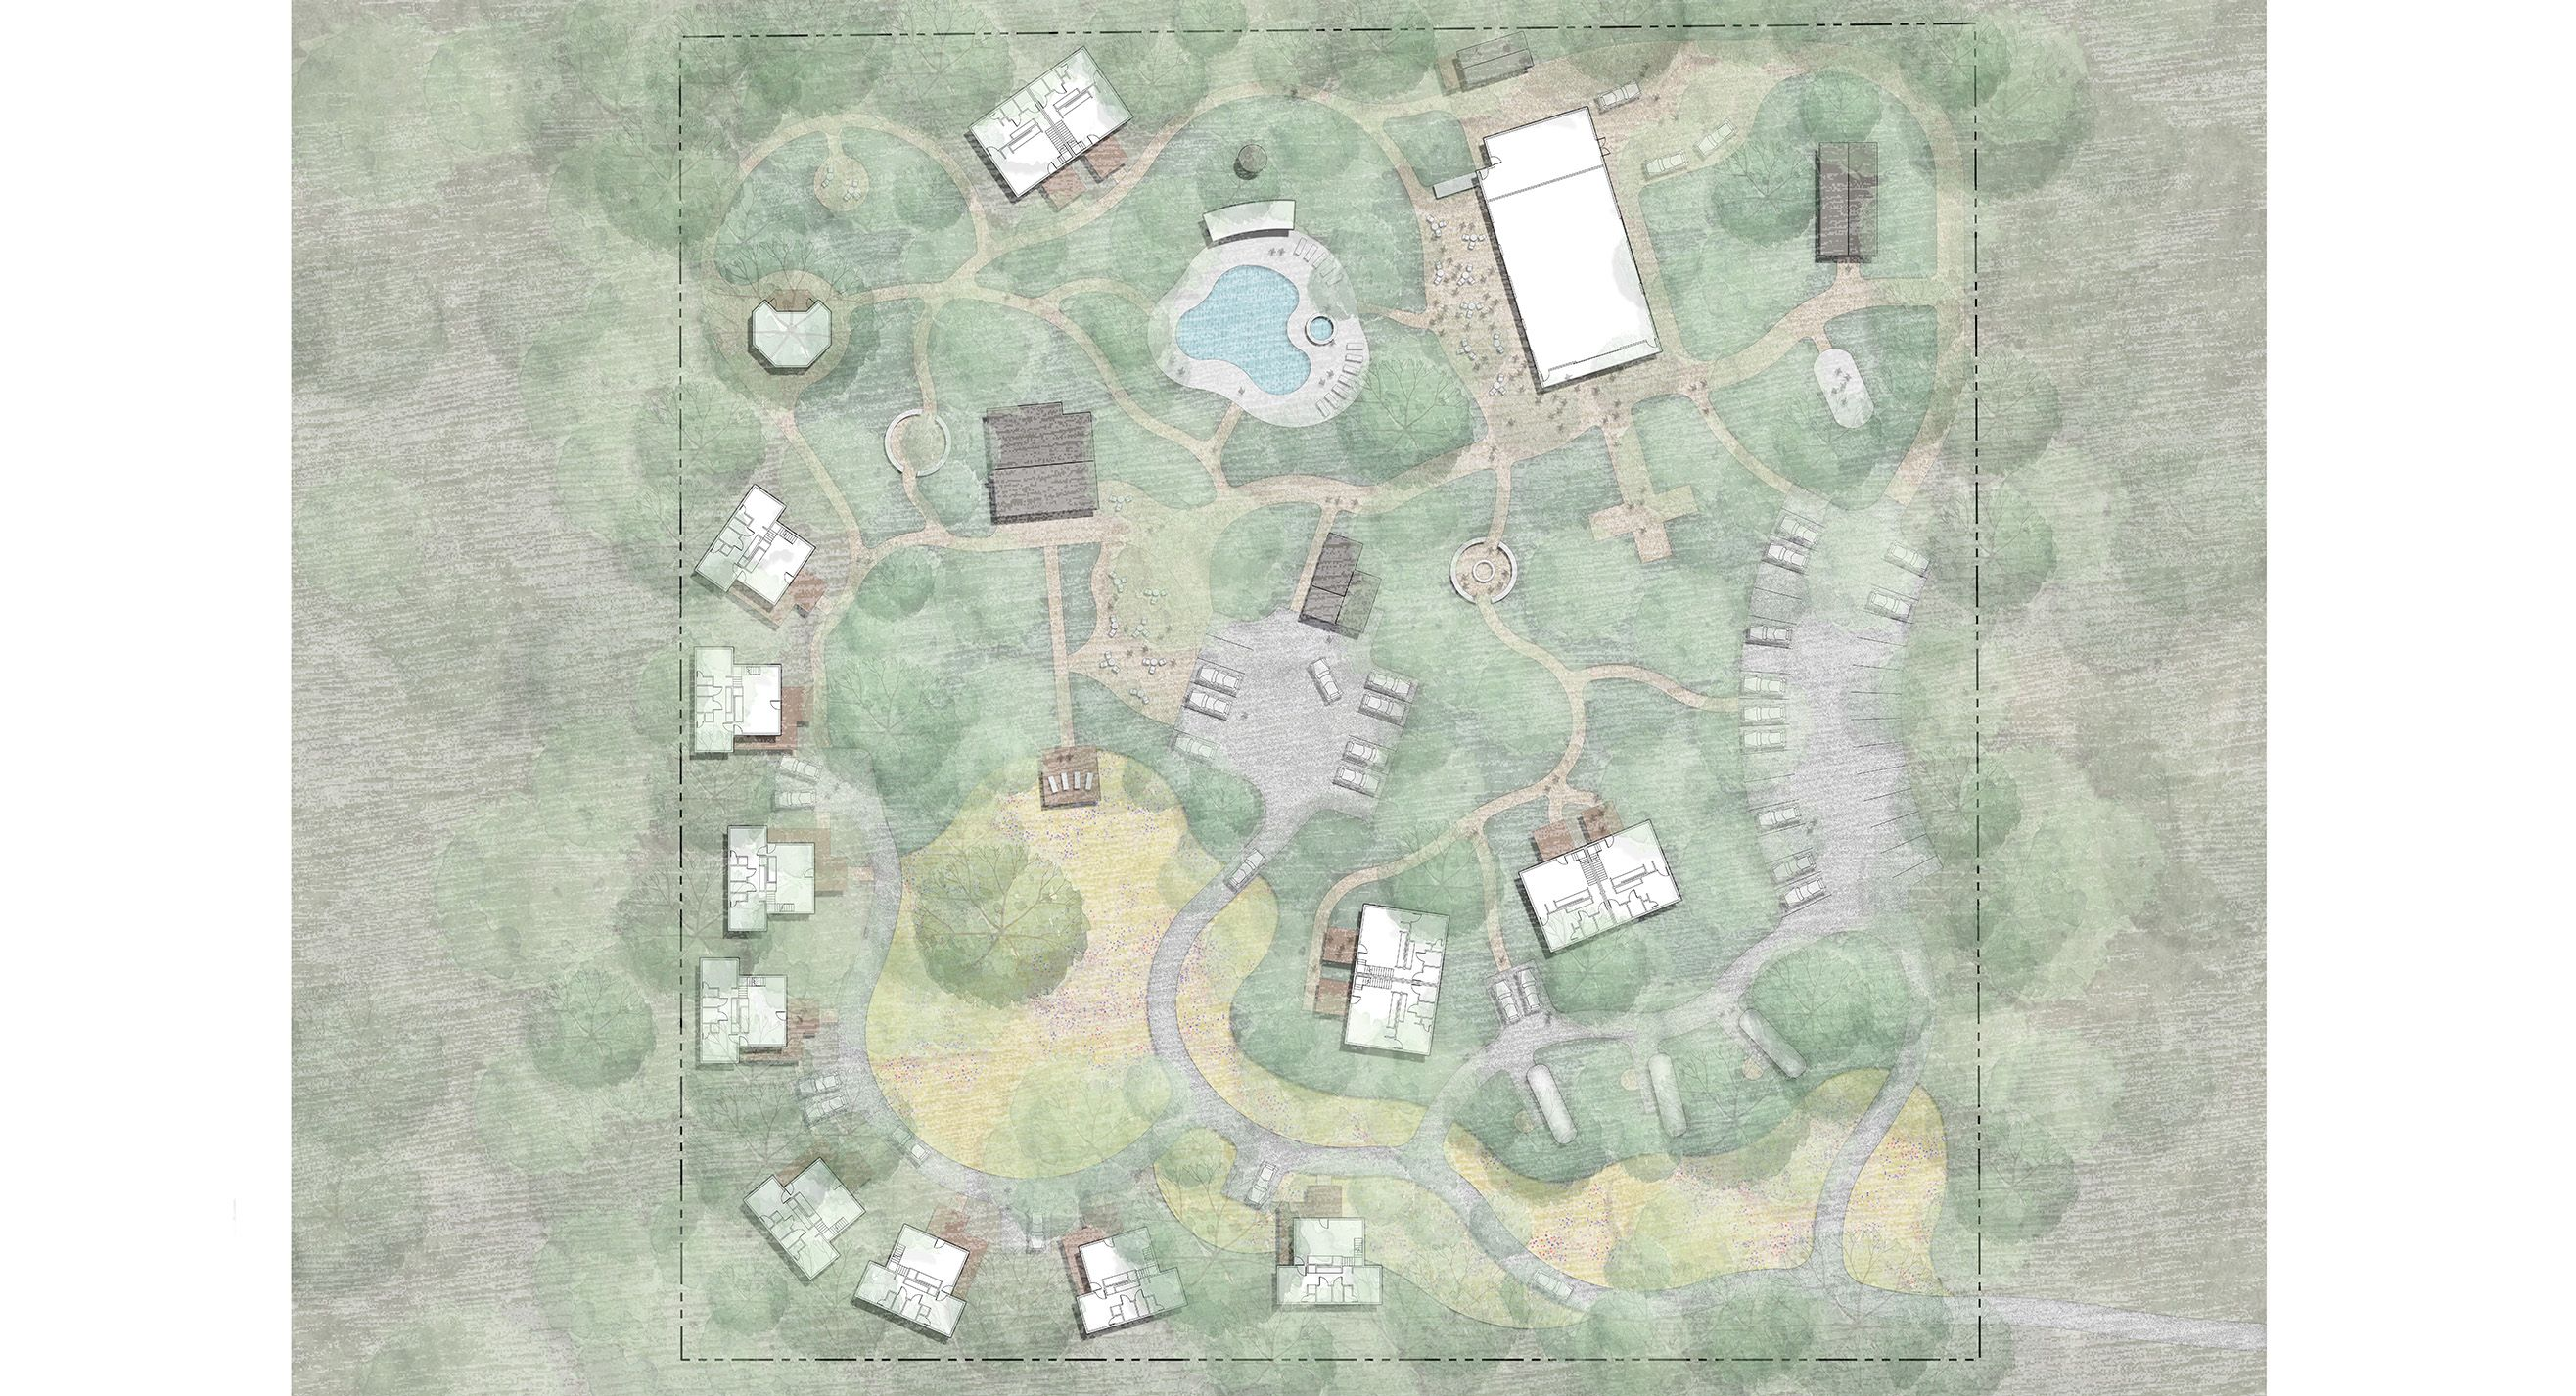 191001 Camp Hideaway Illustrative_web.jpg